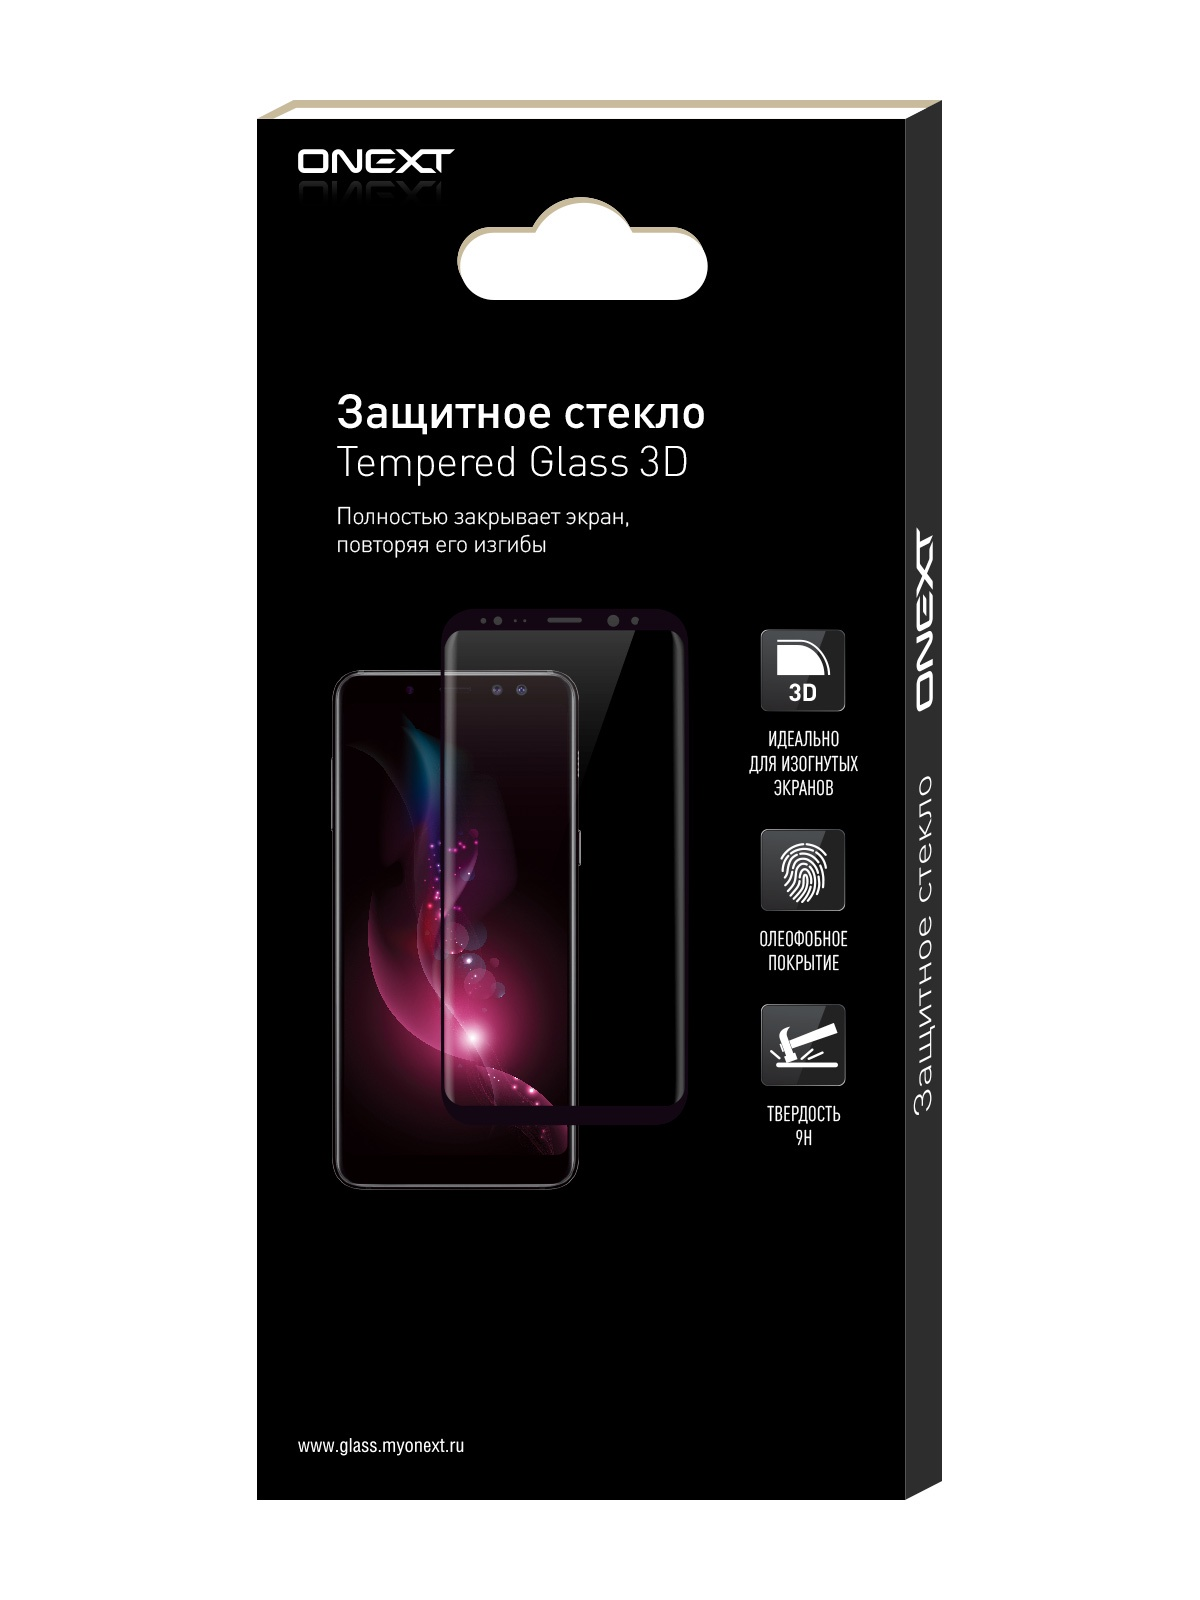 Защитное стекло ONEXT Xiaomi Redmi S2, 3D